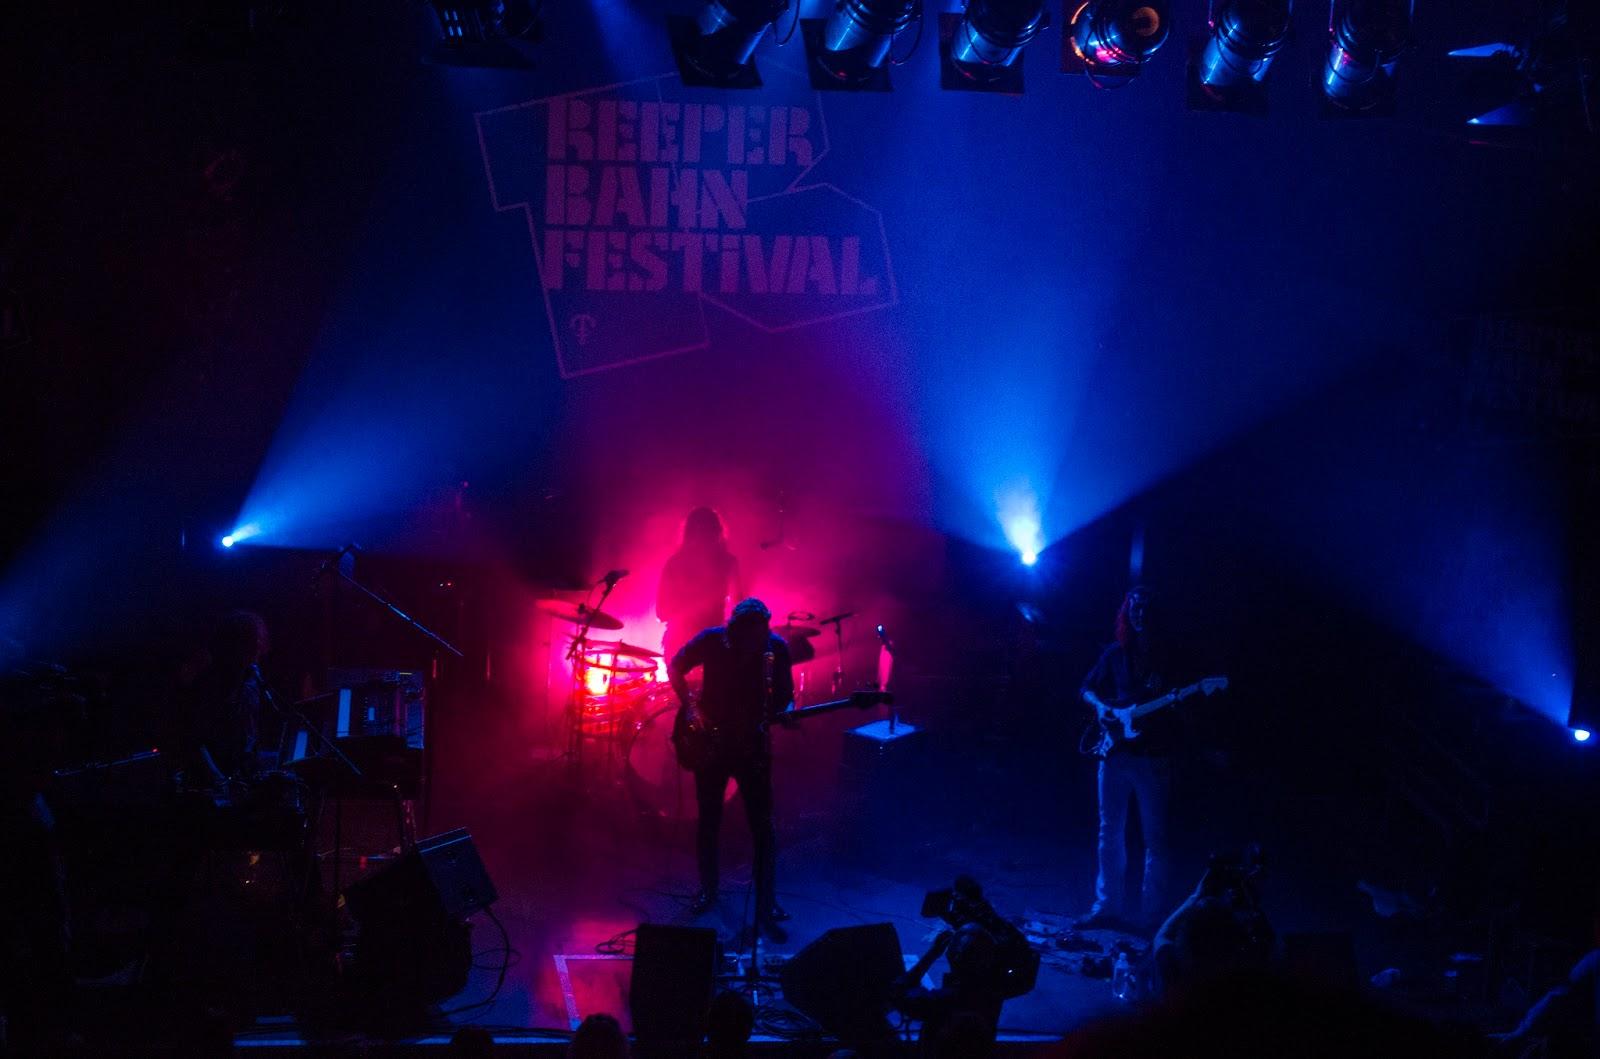 reeperbahn festival 2016 hamburg